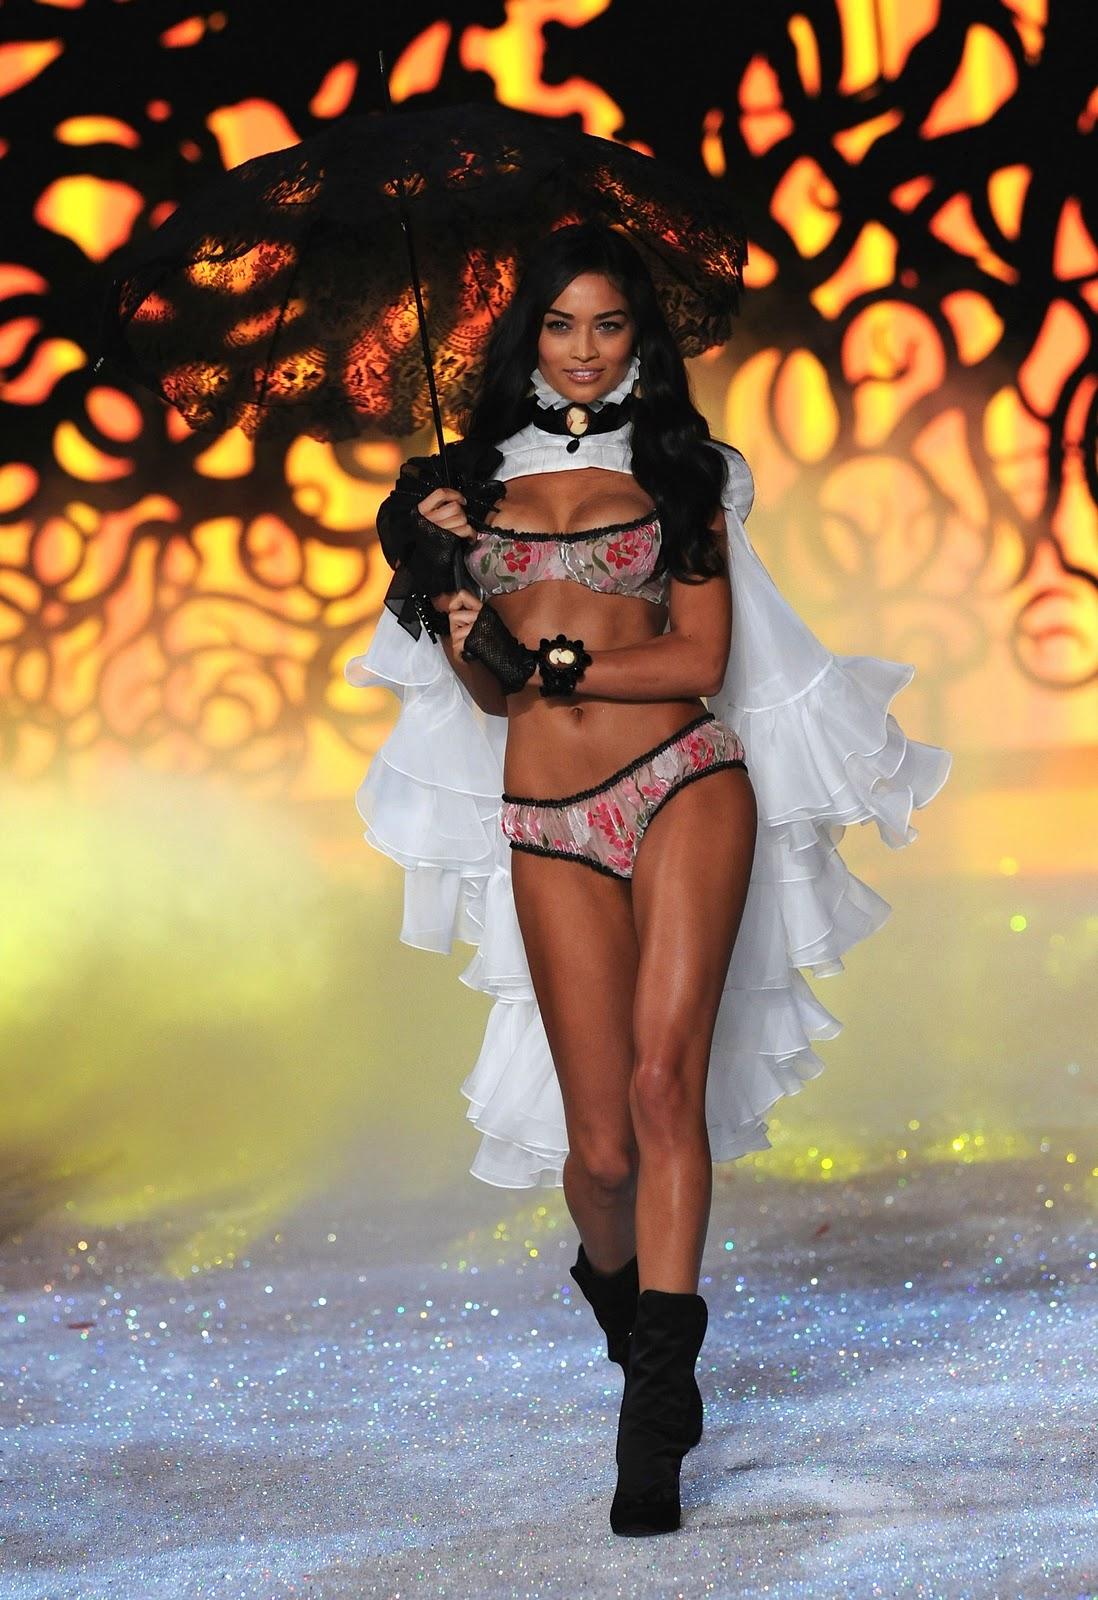 35b7bd6fdc Shanina Shaik  Victoria s Secret Fashion Show 2011 HQ. I really like her.